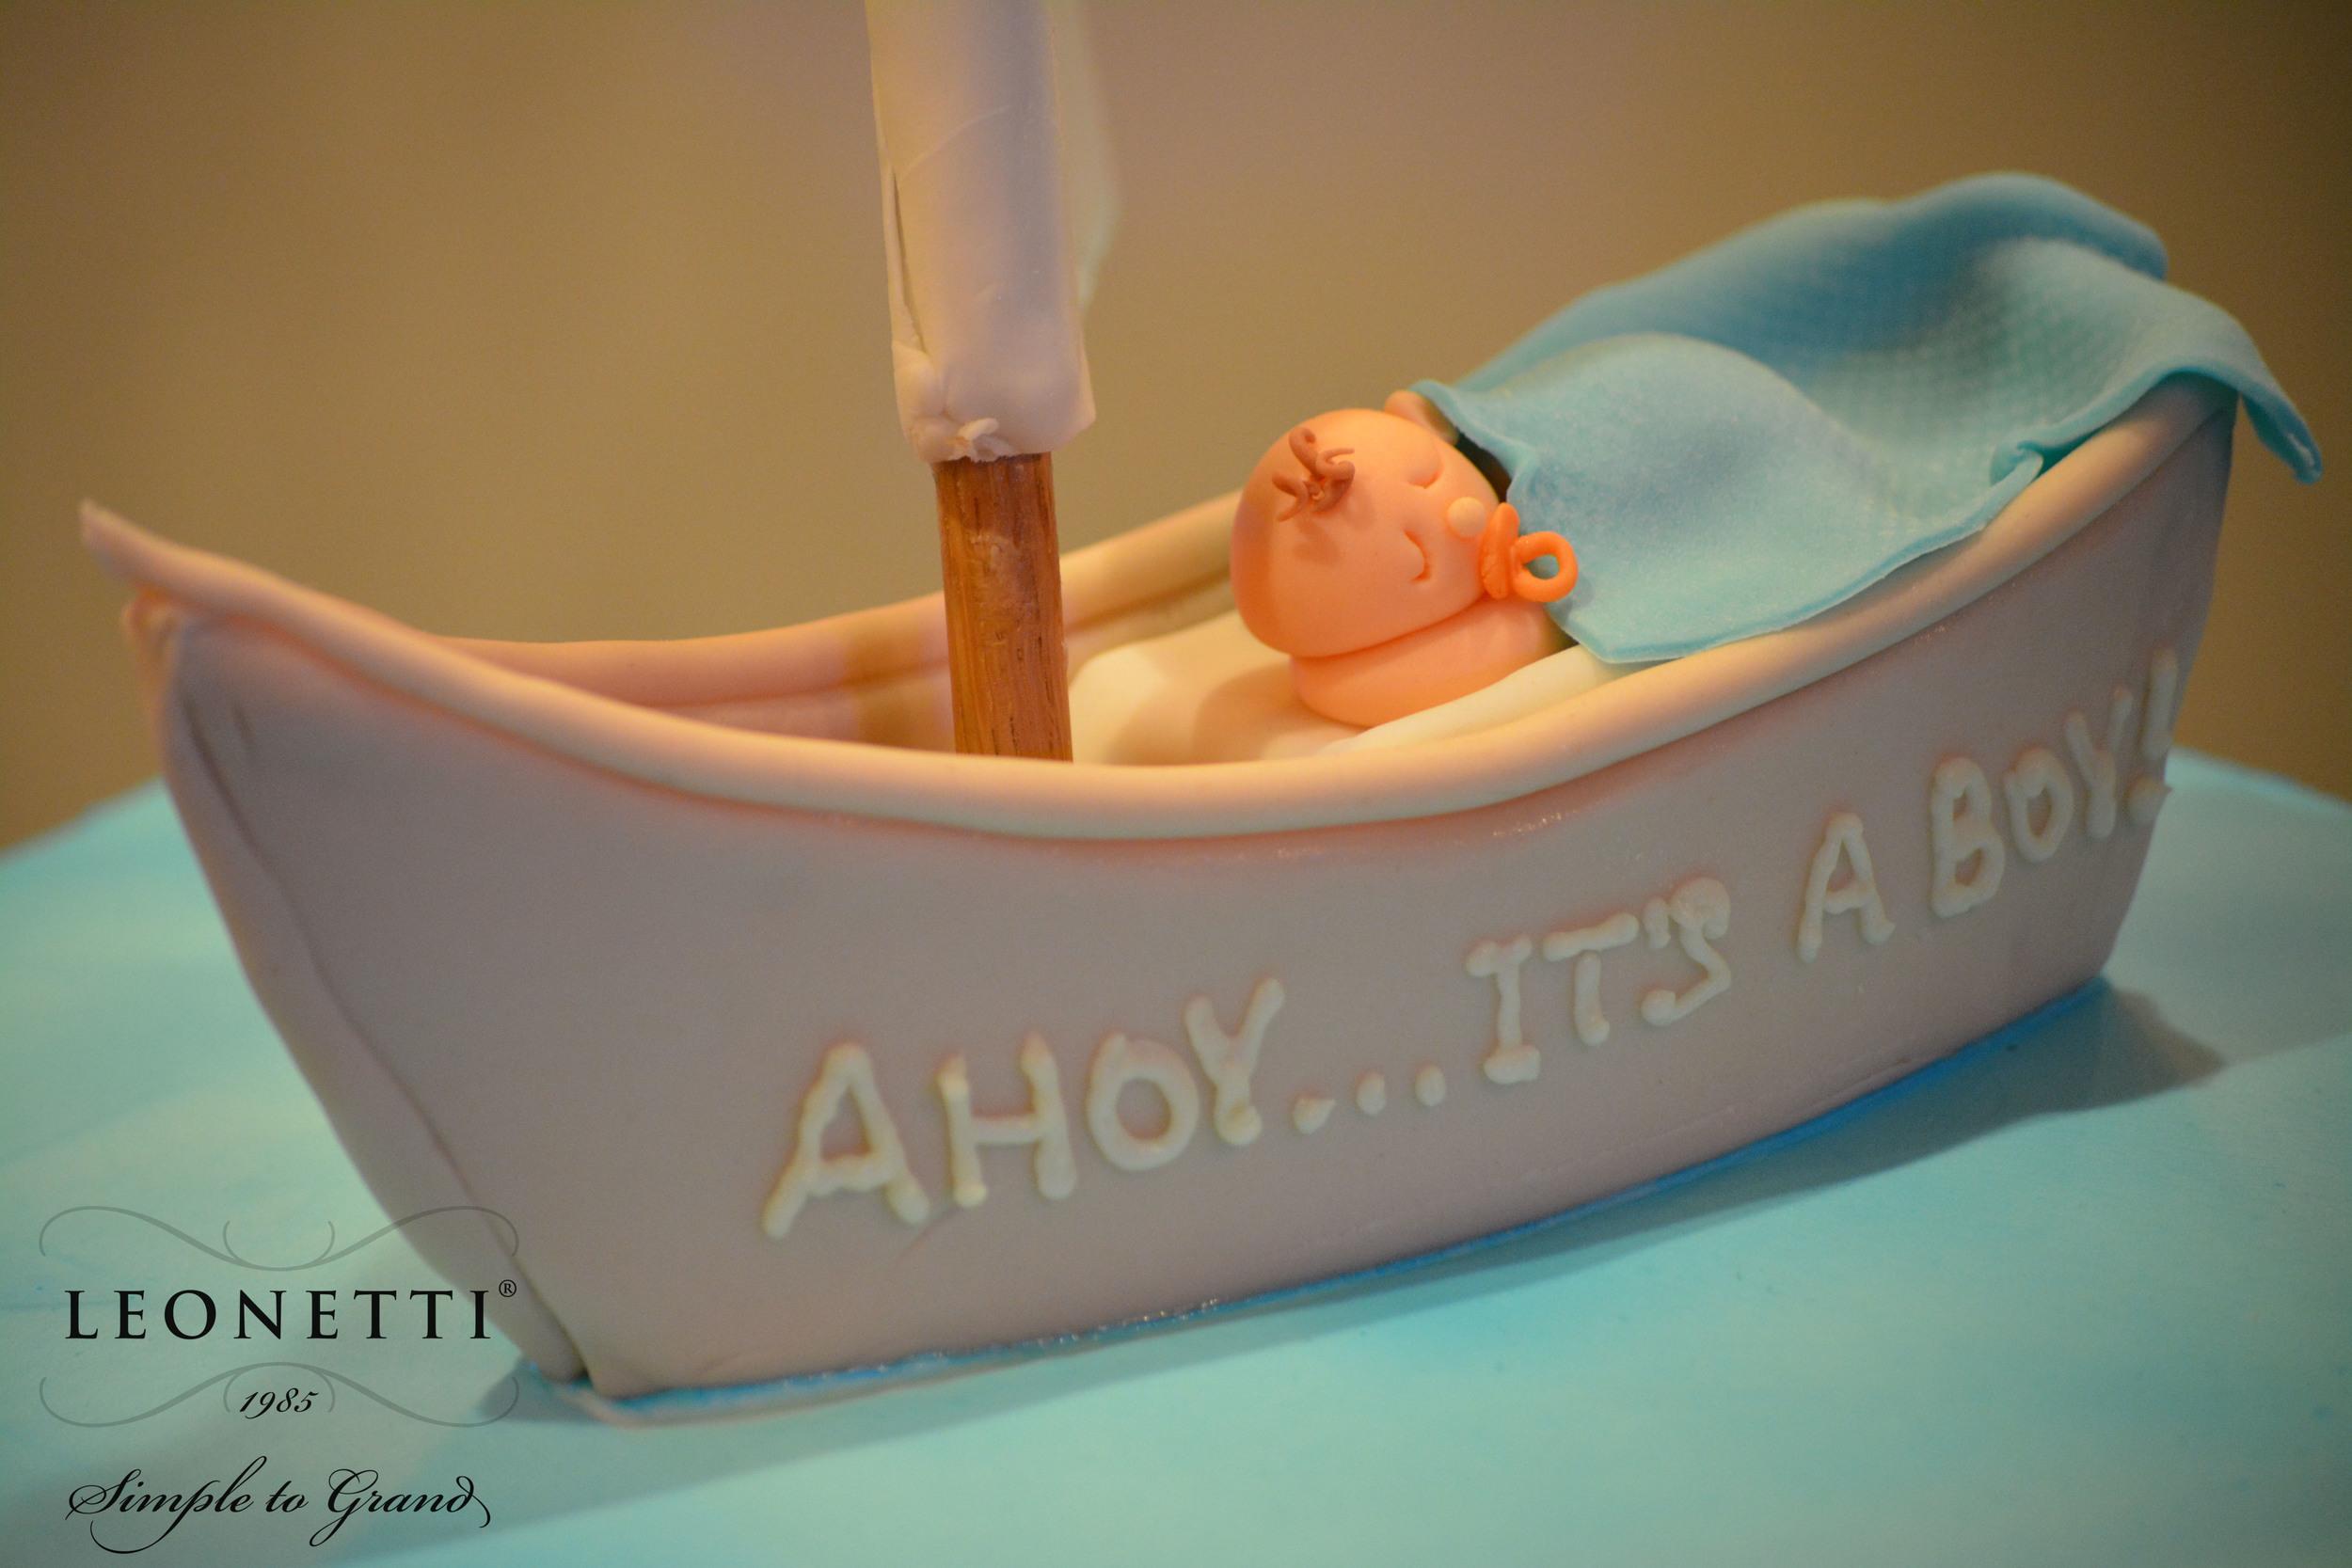 Ahoy3Final.jpg